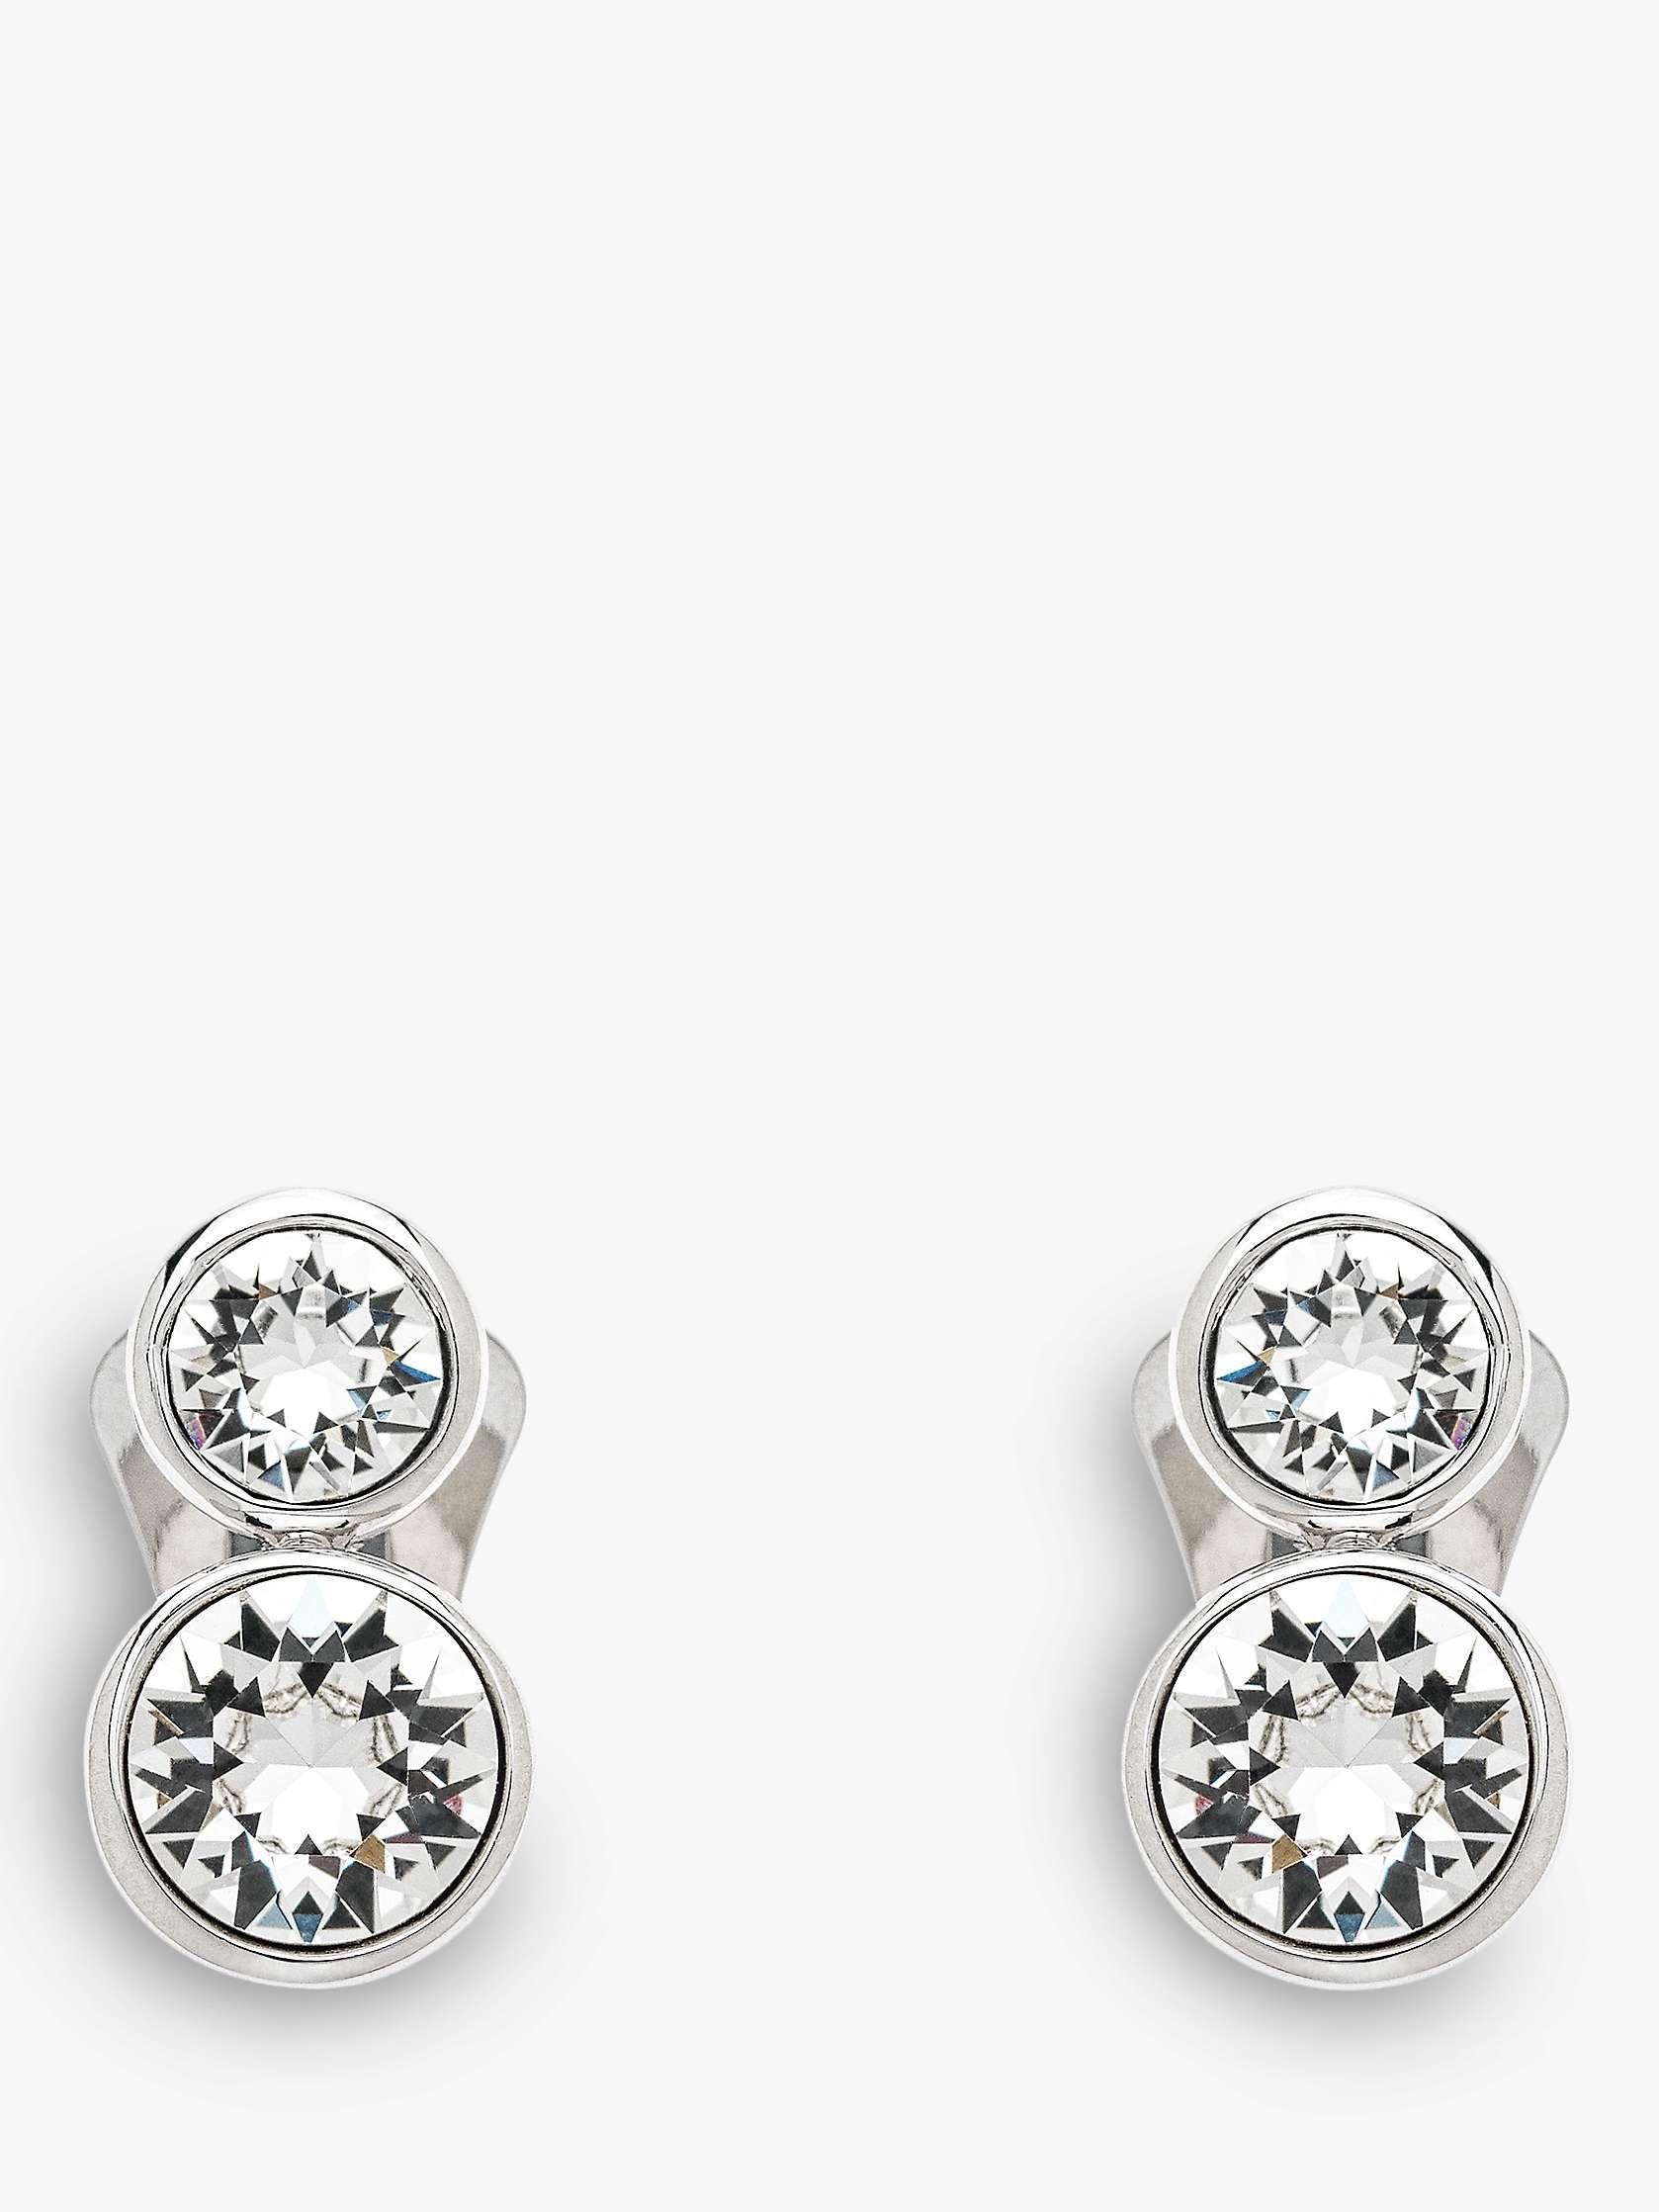 Emma Holland Double Swarovski Crystal Clip On Stud Earrings